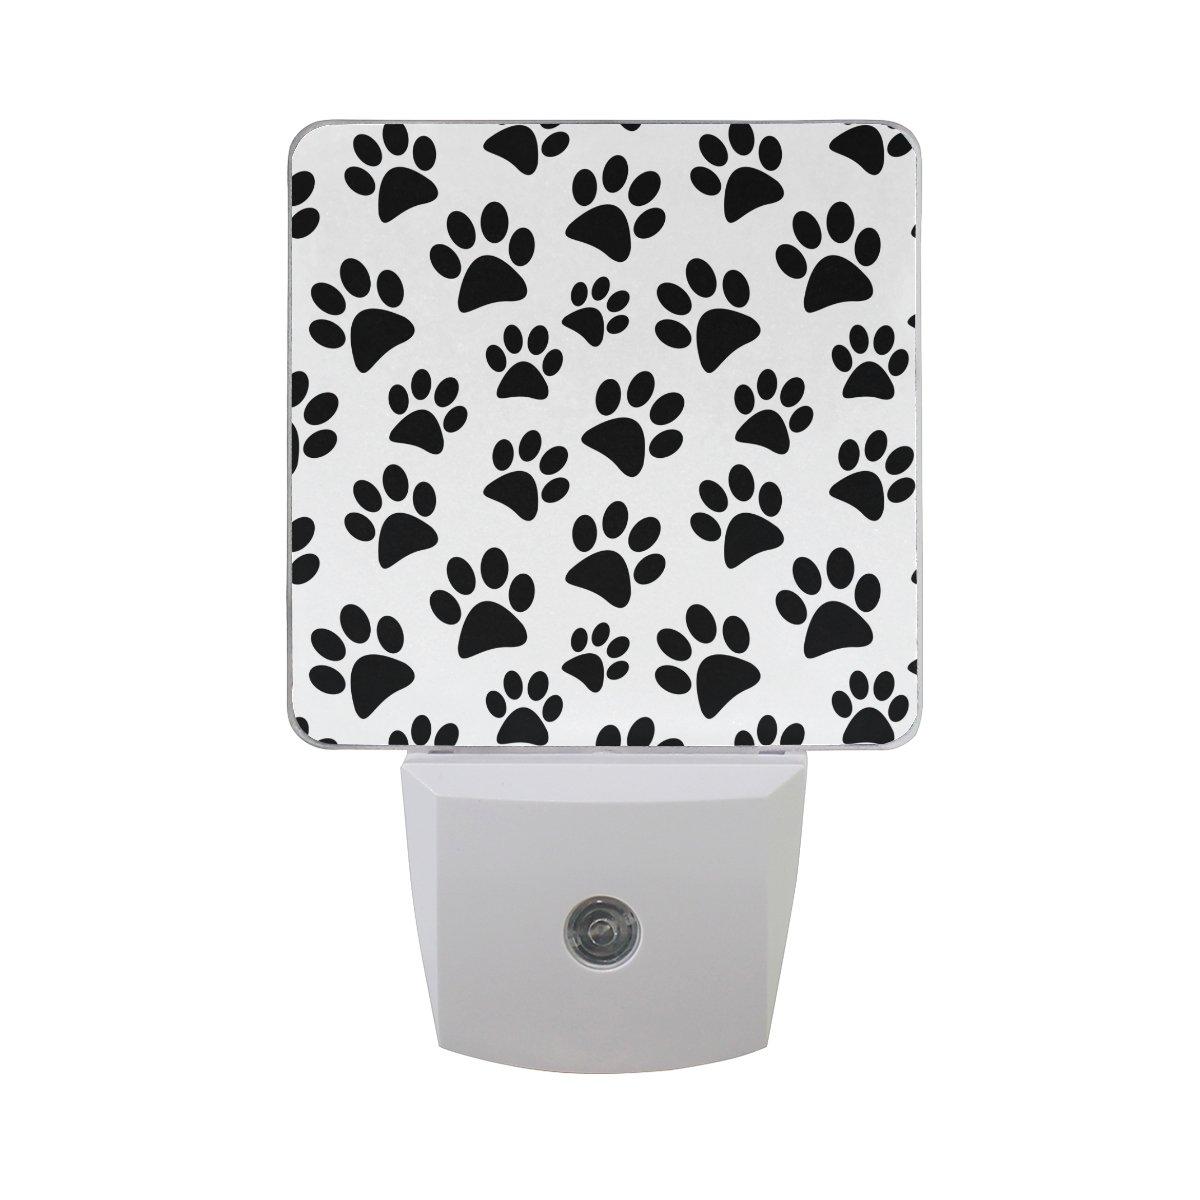 JOYPRINT Led Night Light Animal Dog Cat Paw Print Pattern, Auto Senor Dusk to Dawn Night Light Plug in for Kids Baby Girls Boys Adults Room